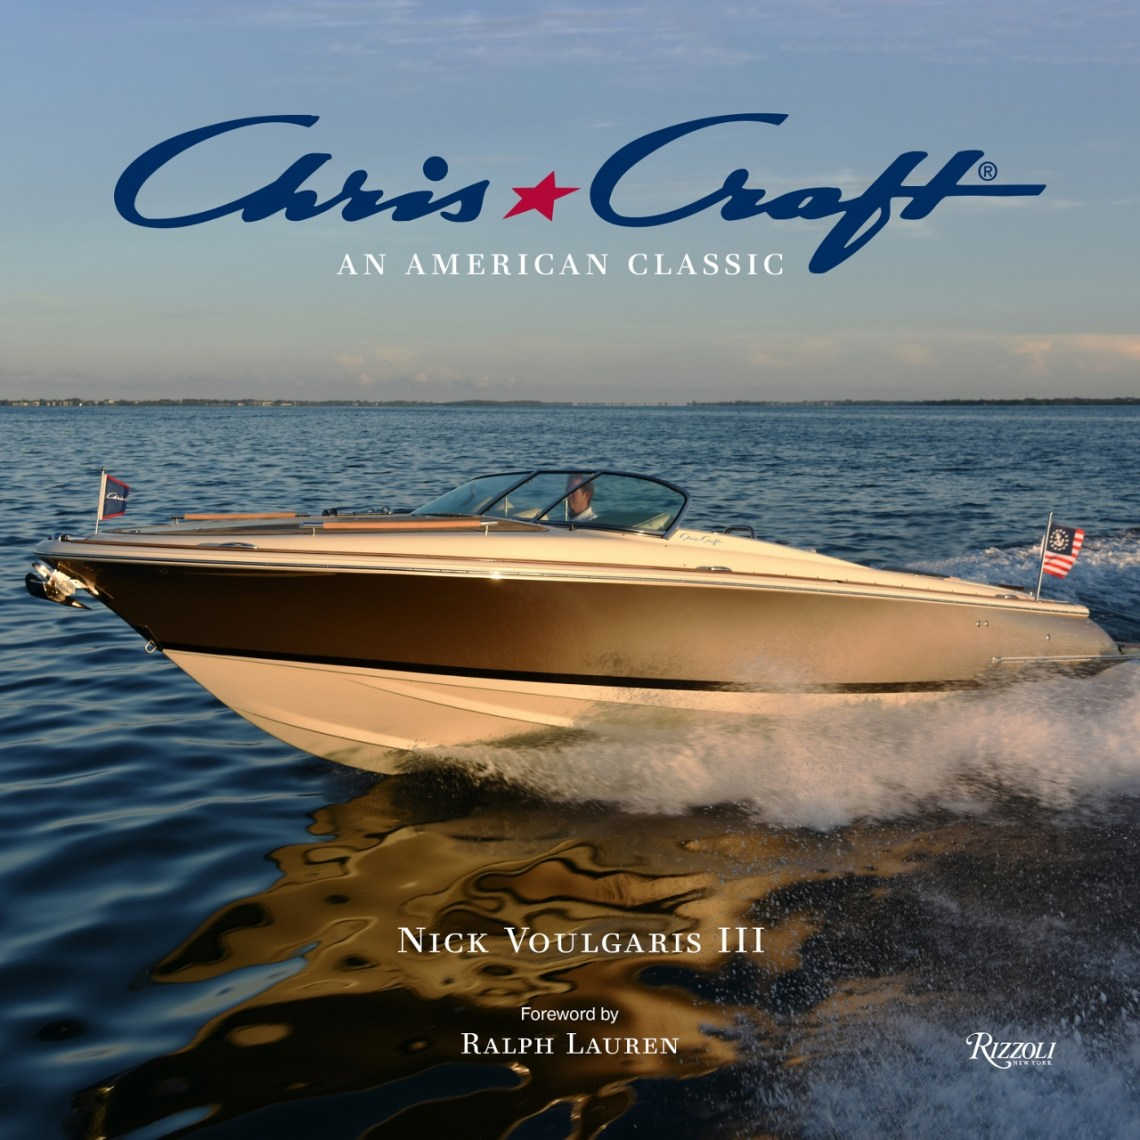 Chris-Craft 01